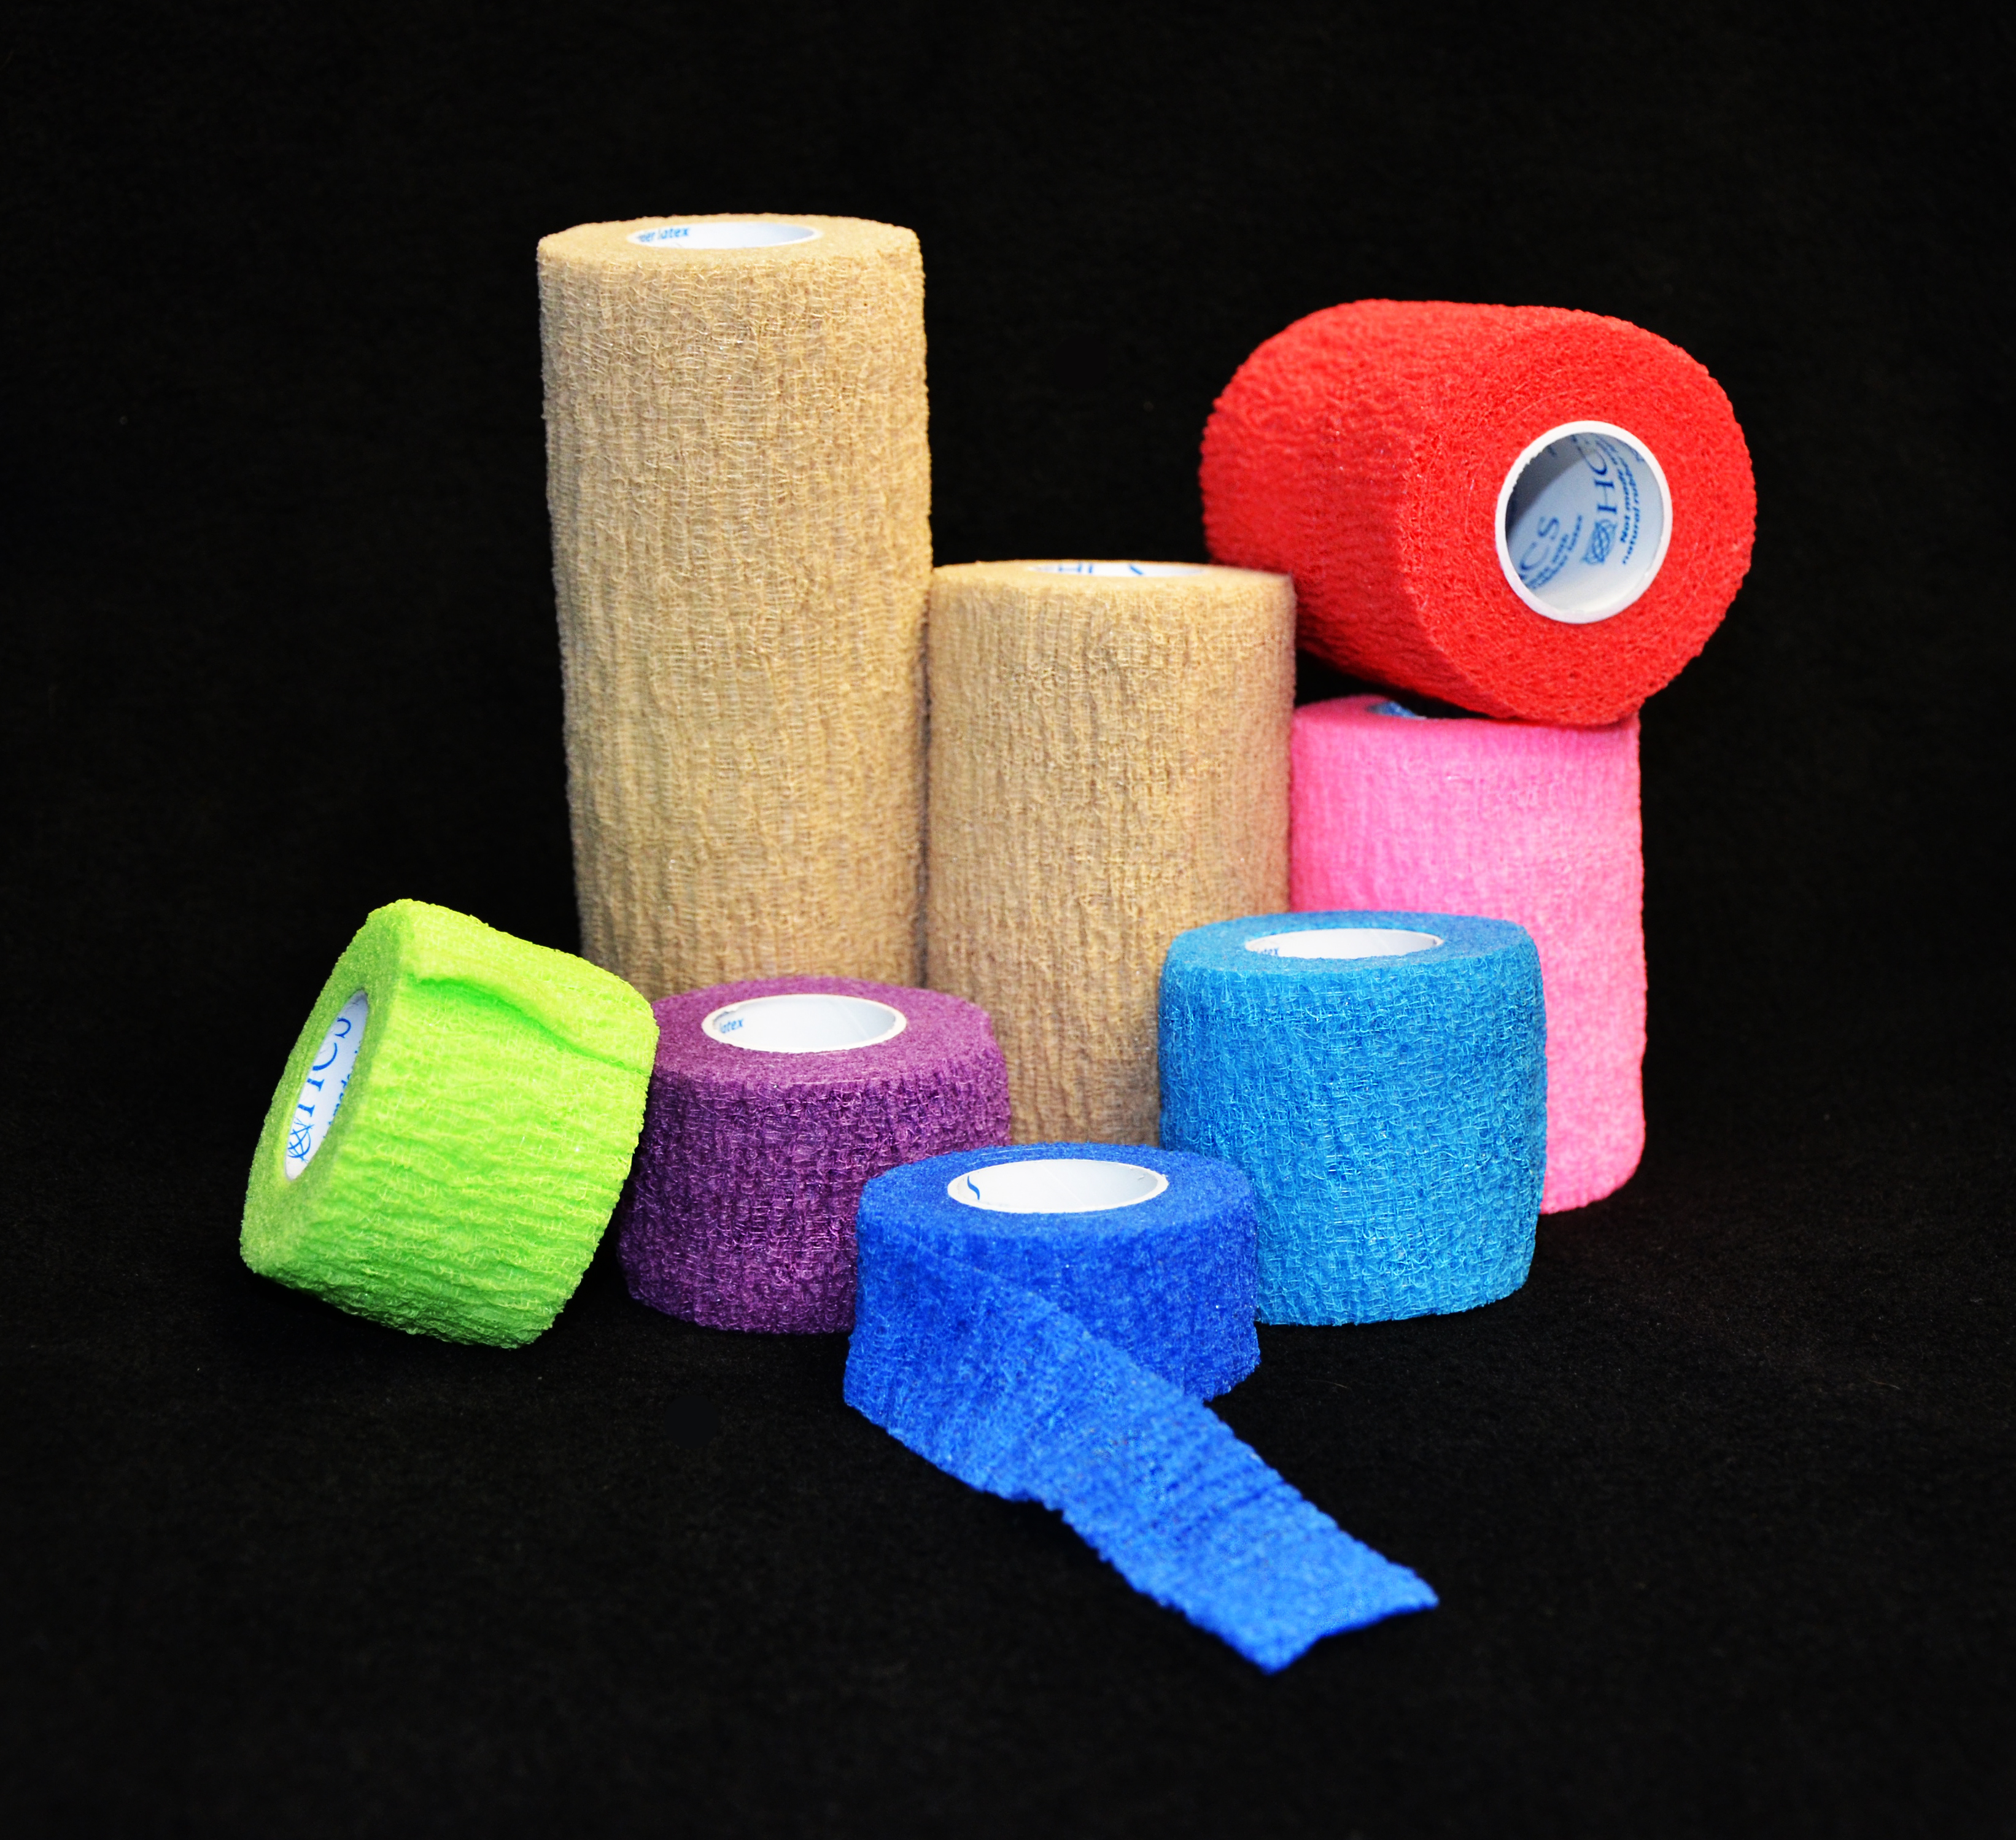 Bandage Cohesive Sterile